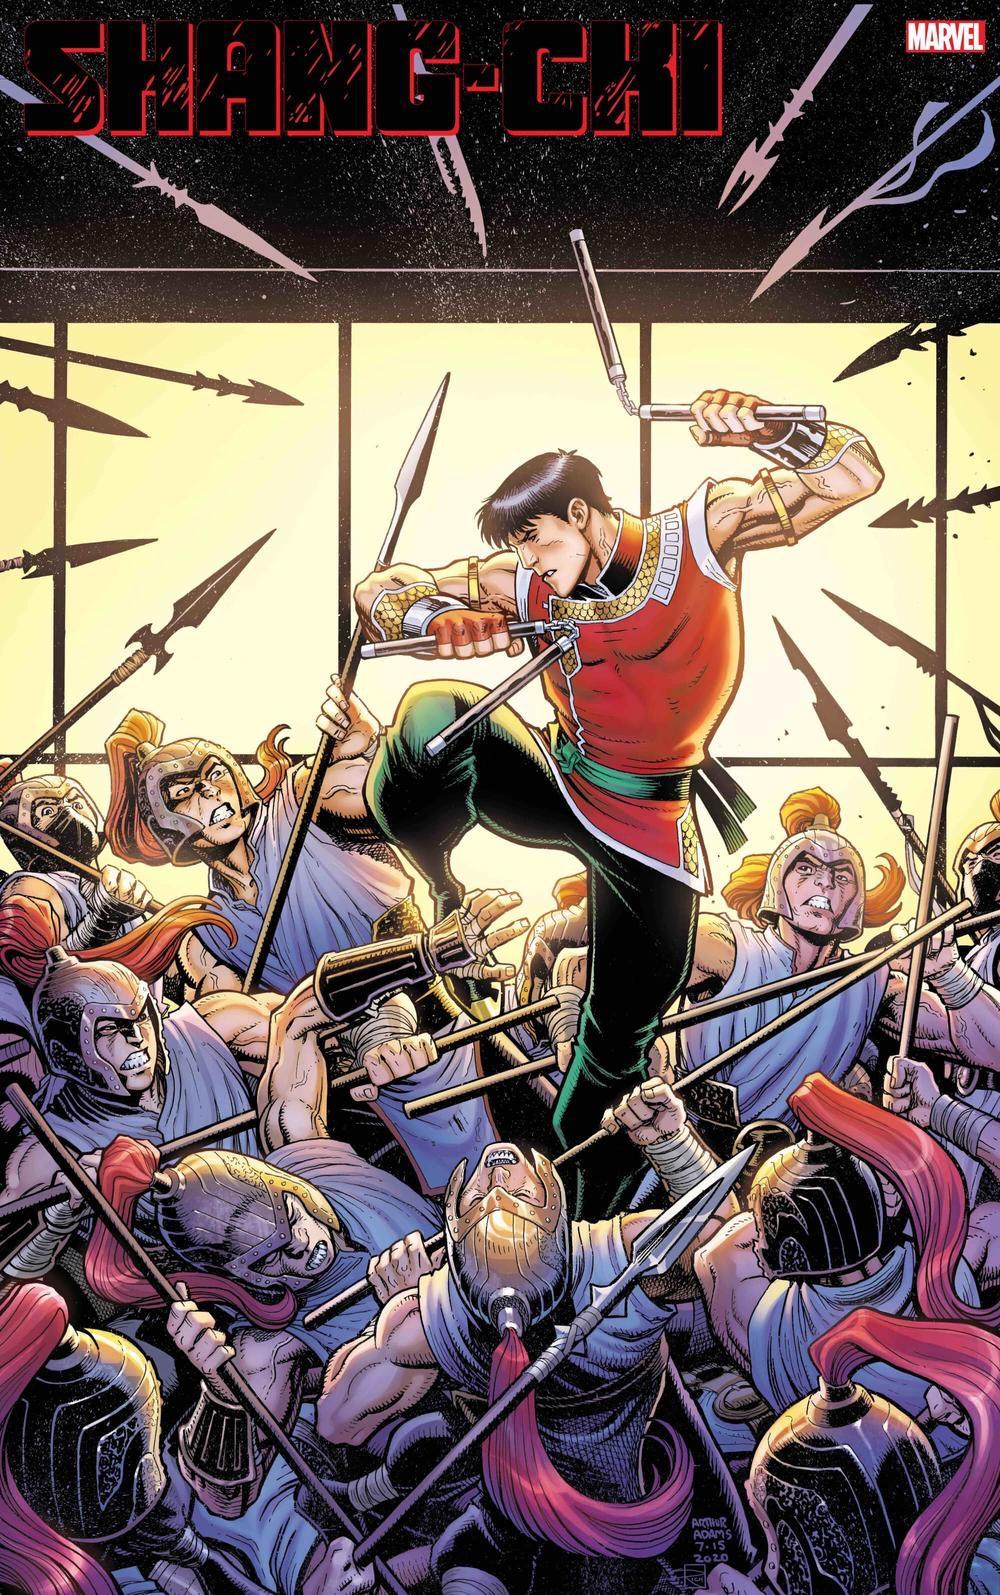 Shang Chi #1 Variant Cover by Arthur Adams